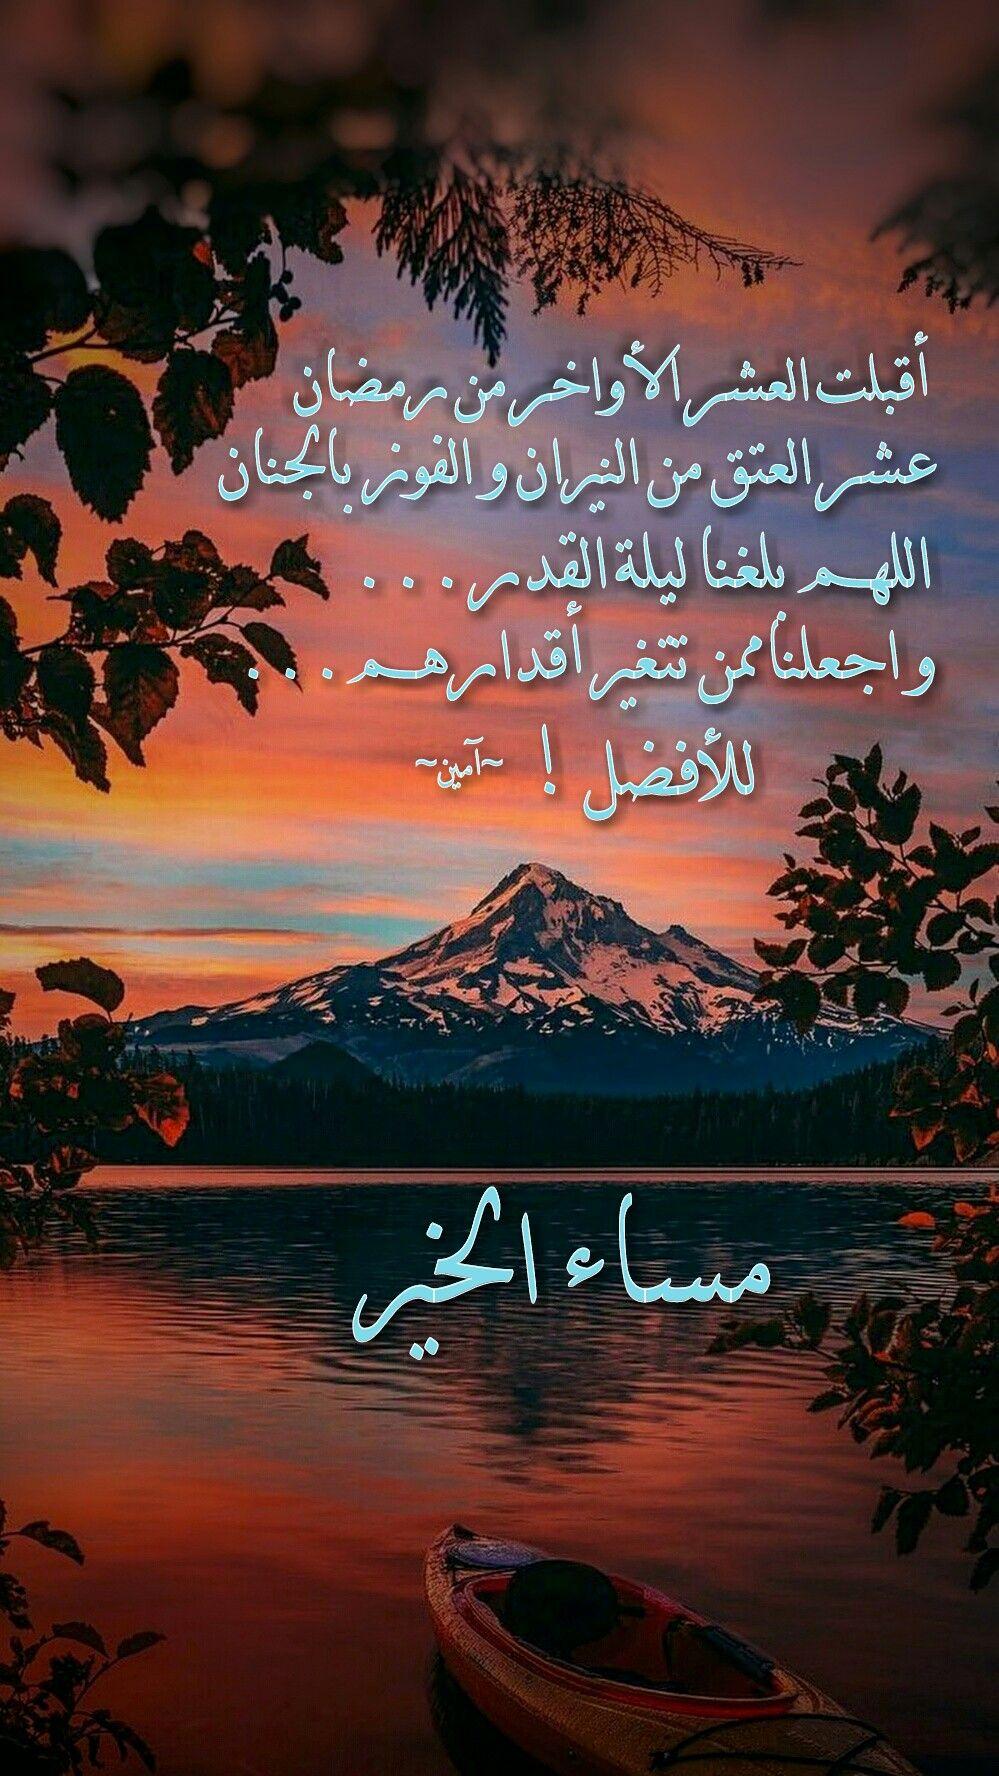 Pin By Ranya Anis On صباحيات و مسائيات Ramadan Islam Poster